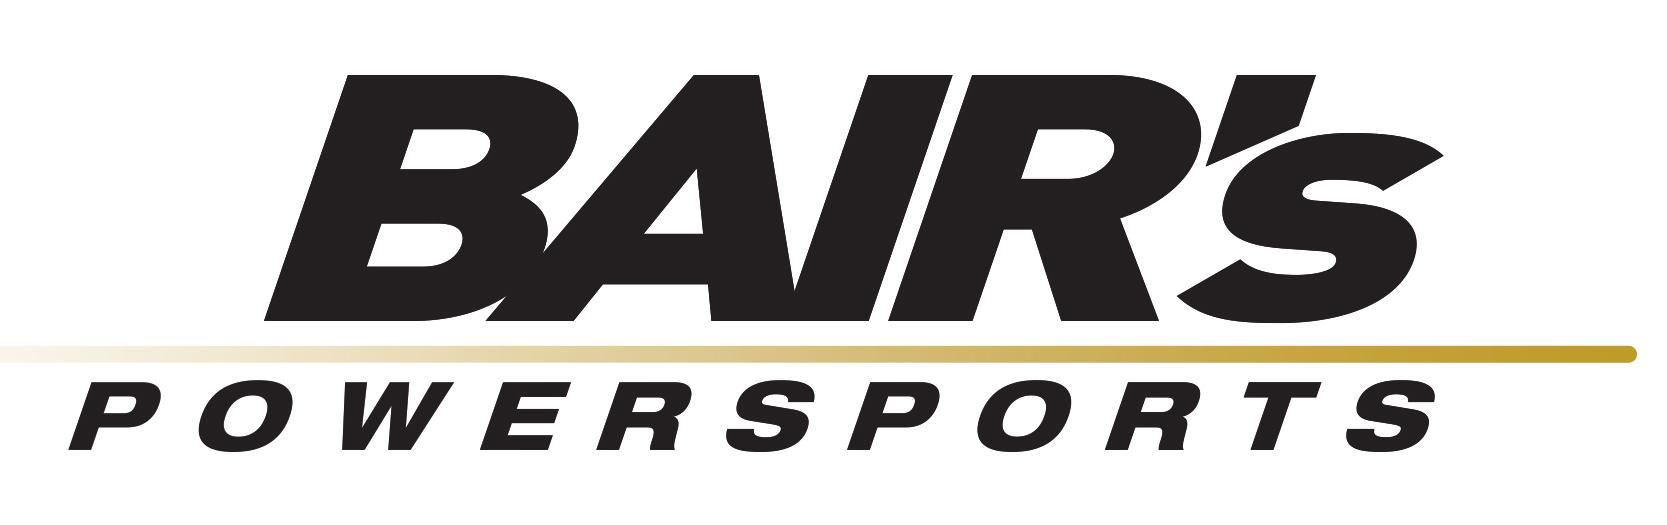 bairs powersports